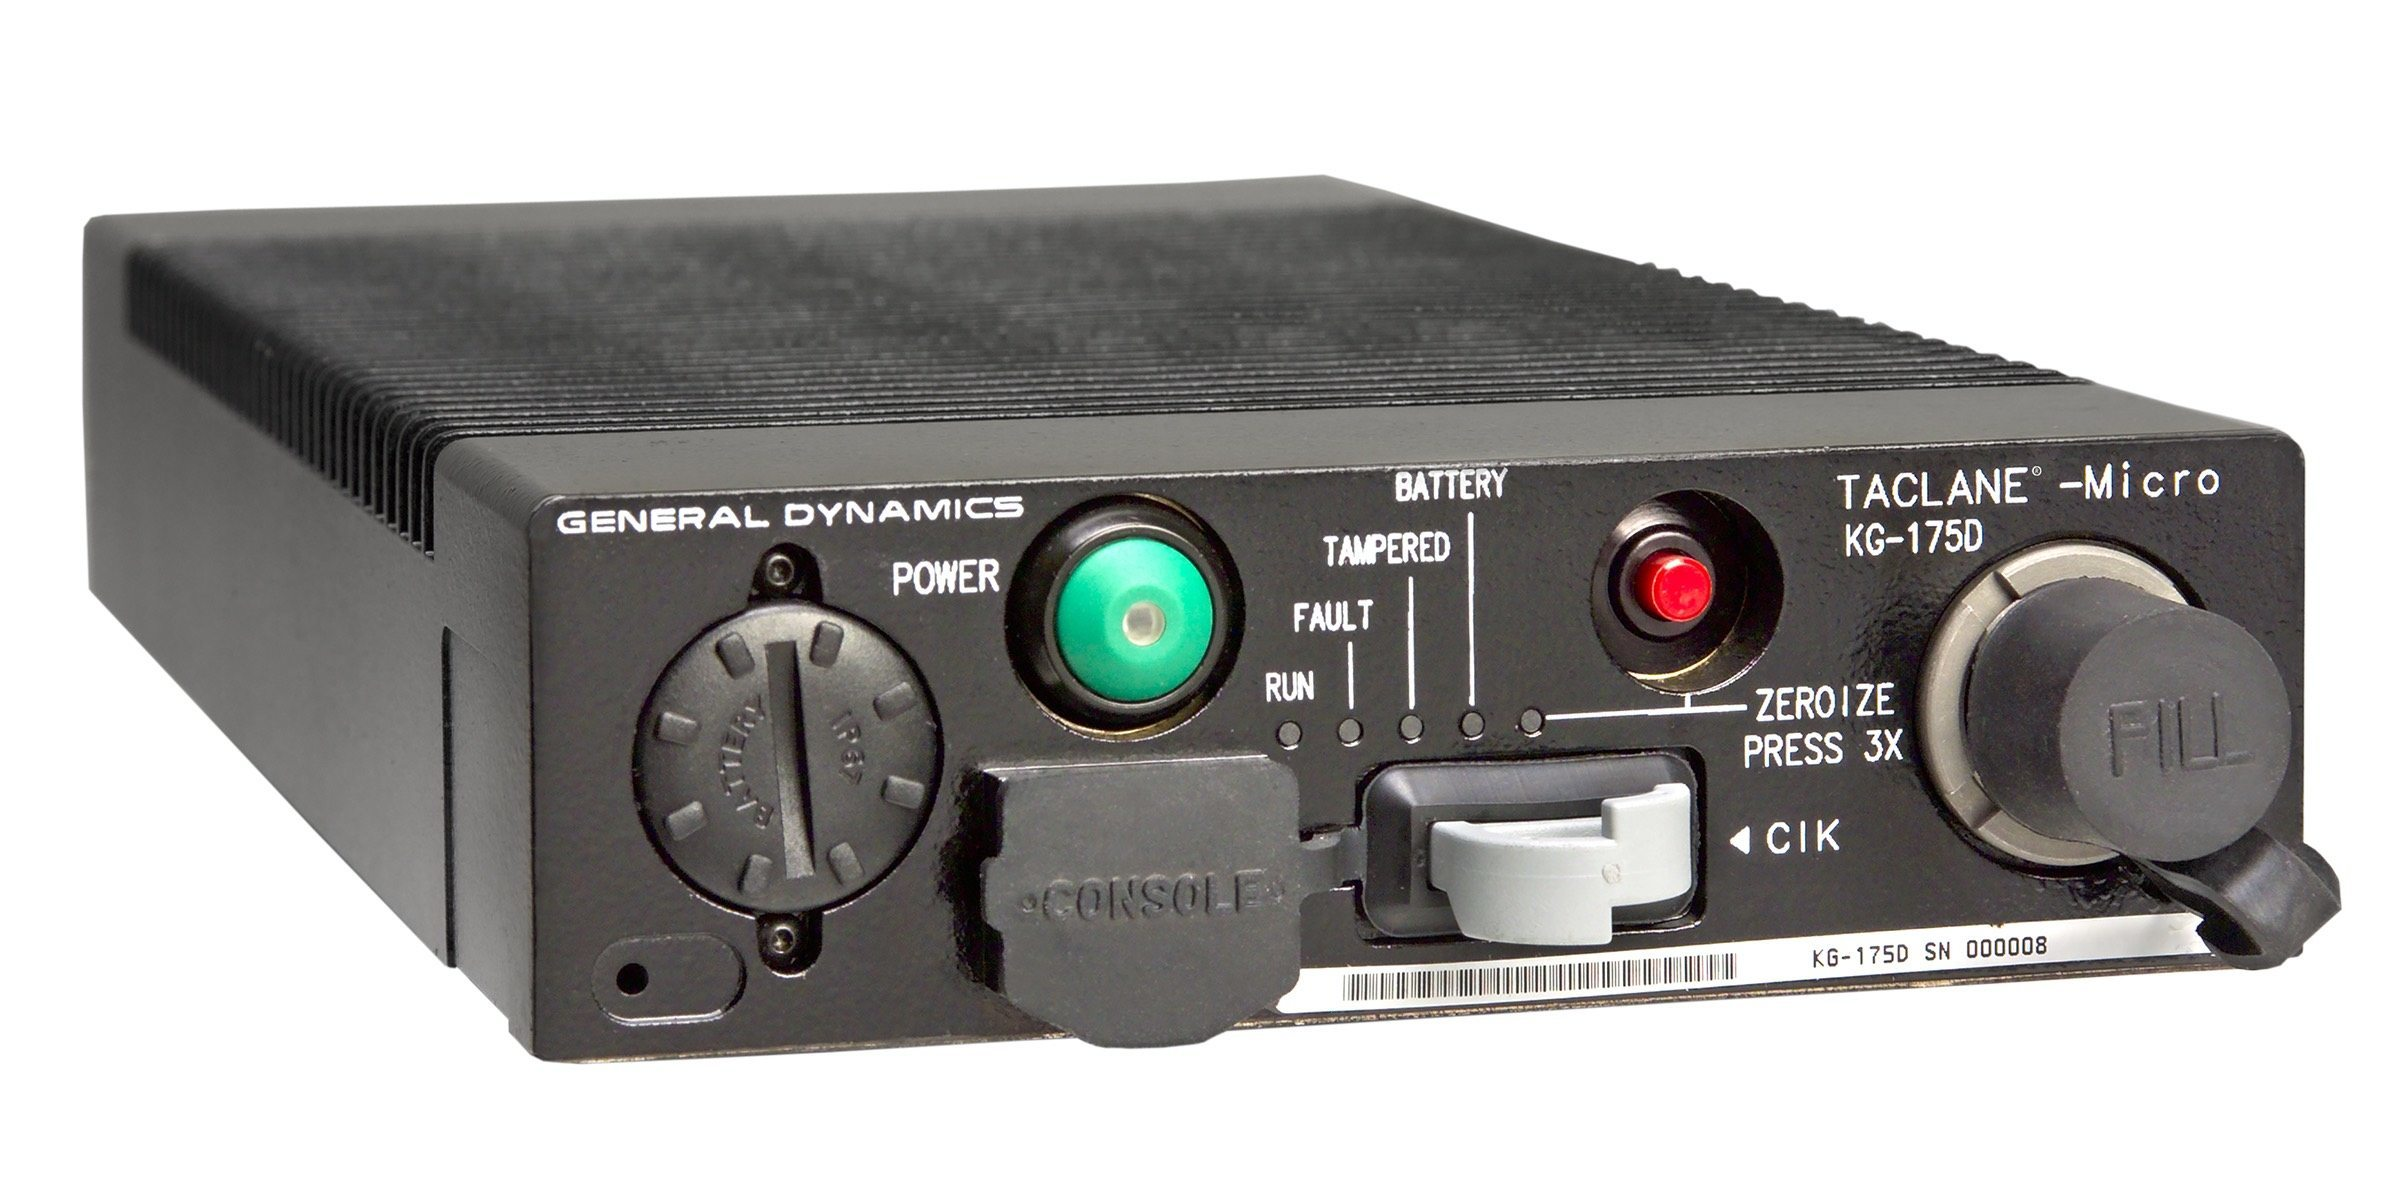 taclane-micro-kg-175d.jpg